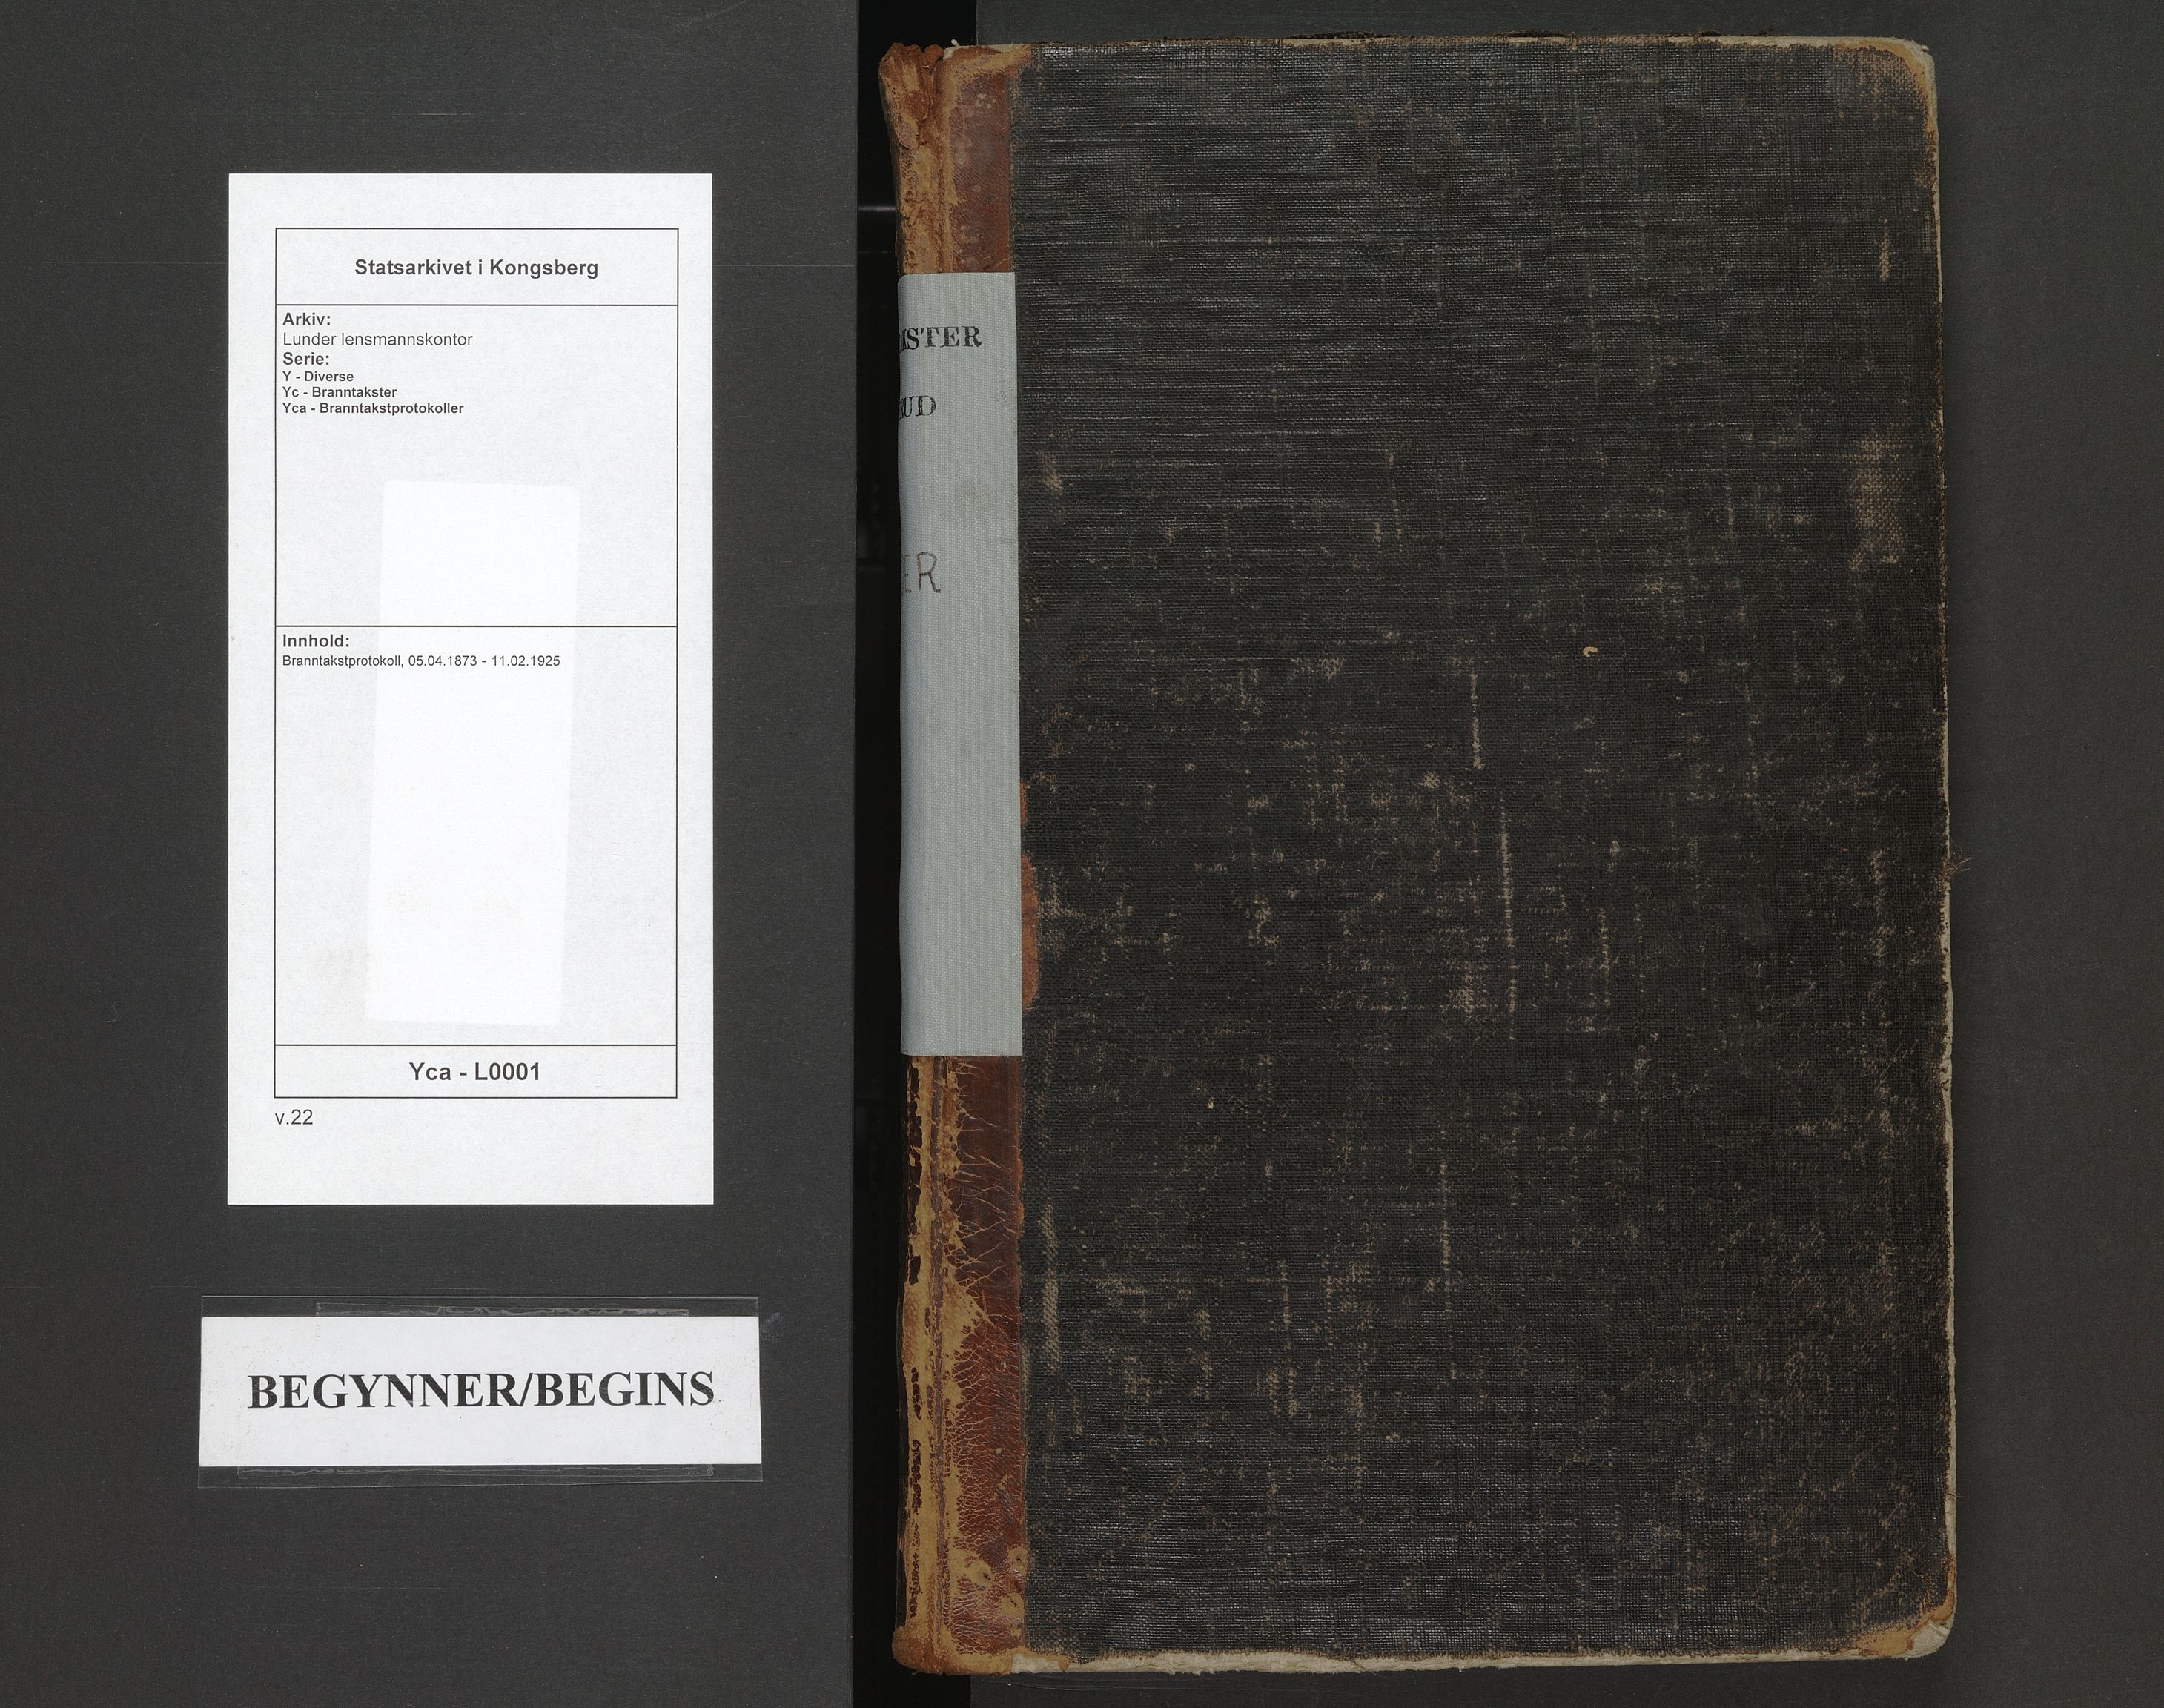 SAKO, Lunder lensmannskontor, Y/Yc/Yca/L0001: Branntakstprotokoll, 1873-1925